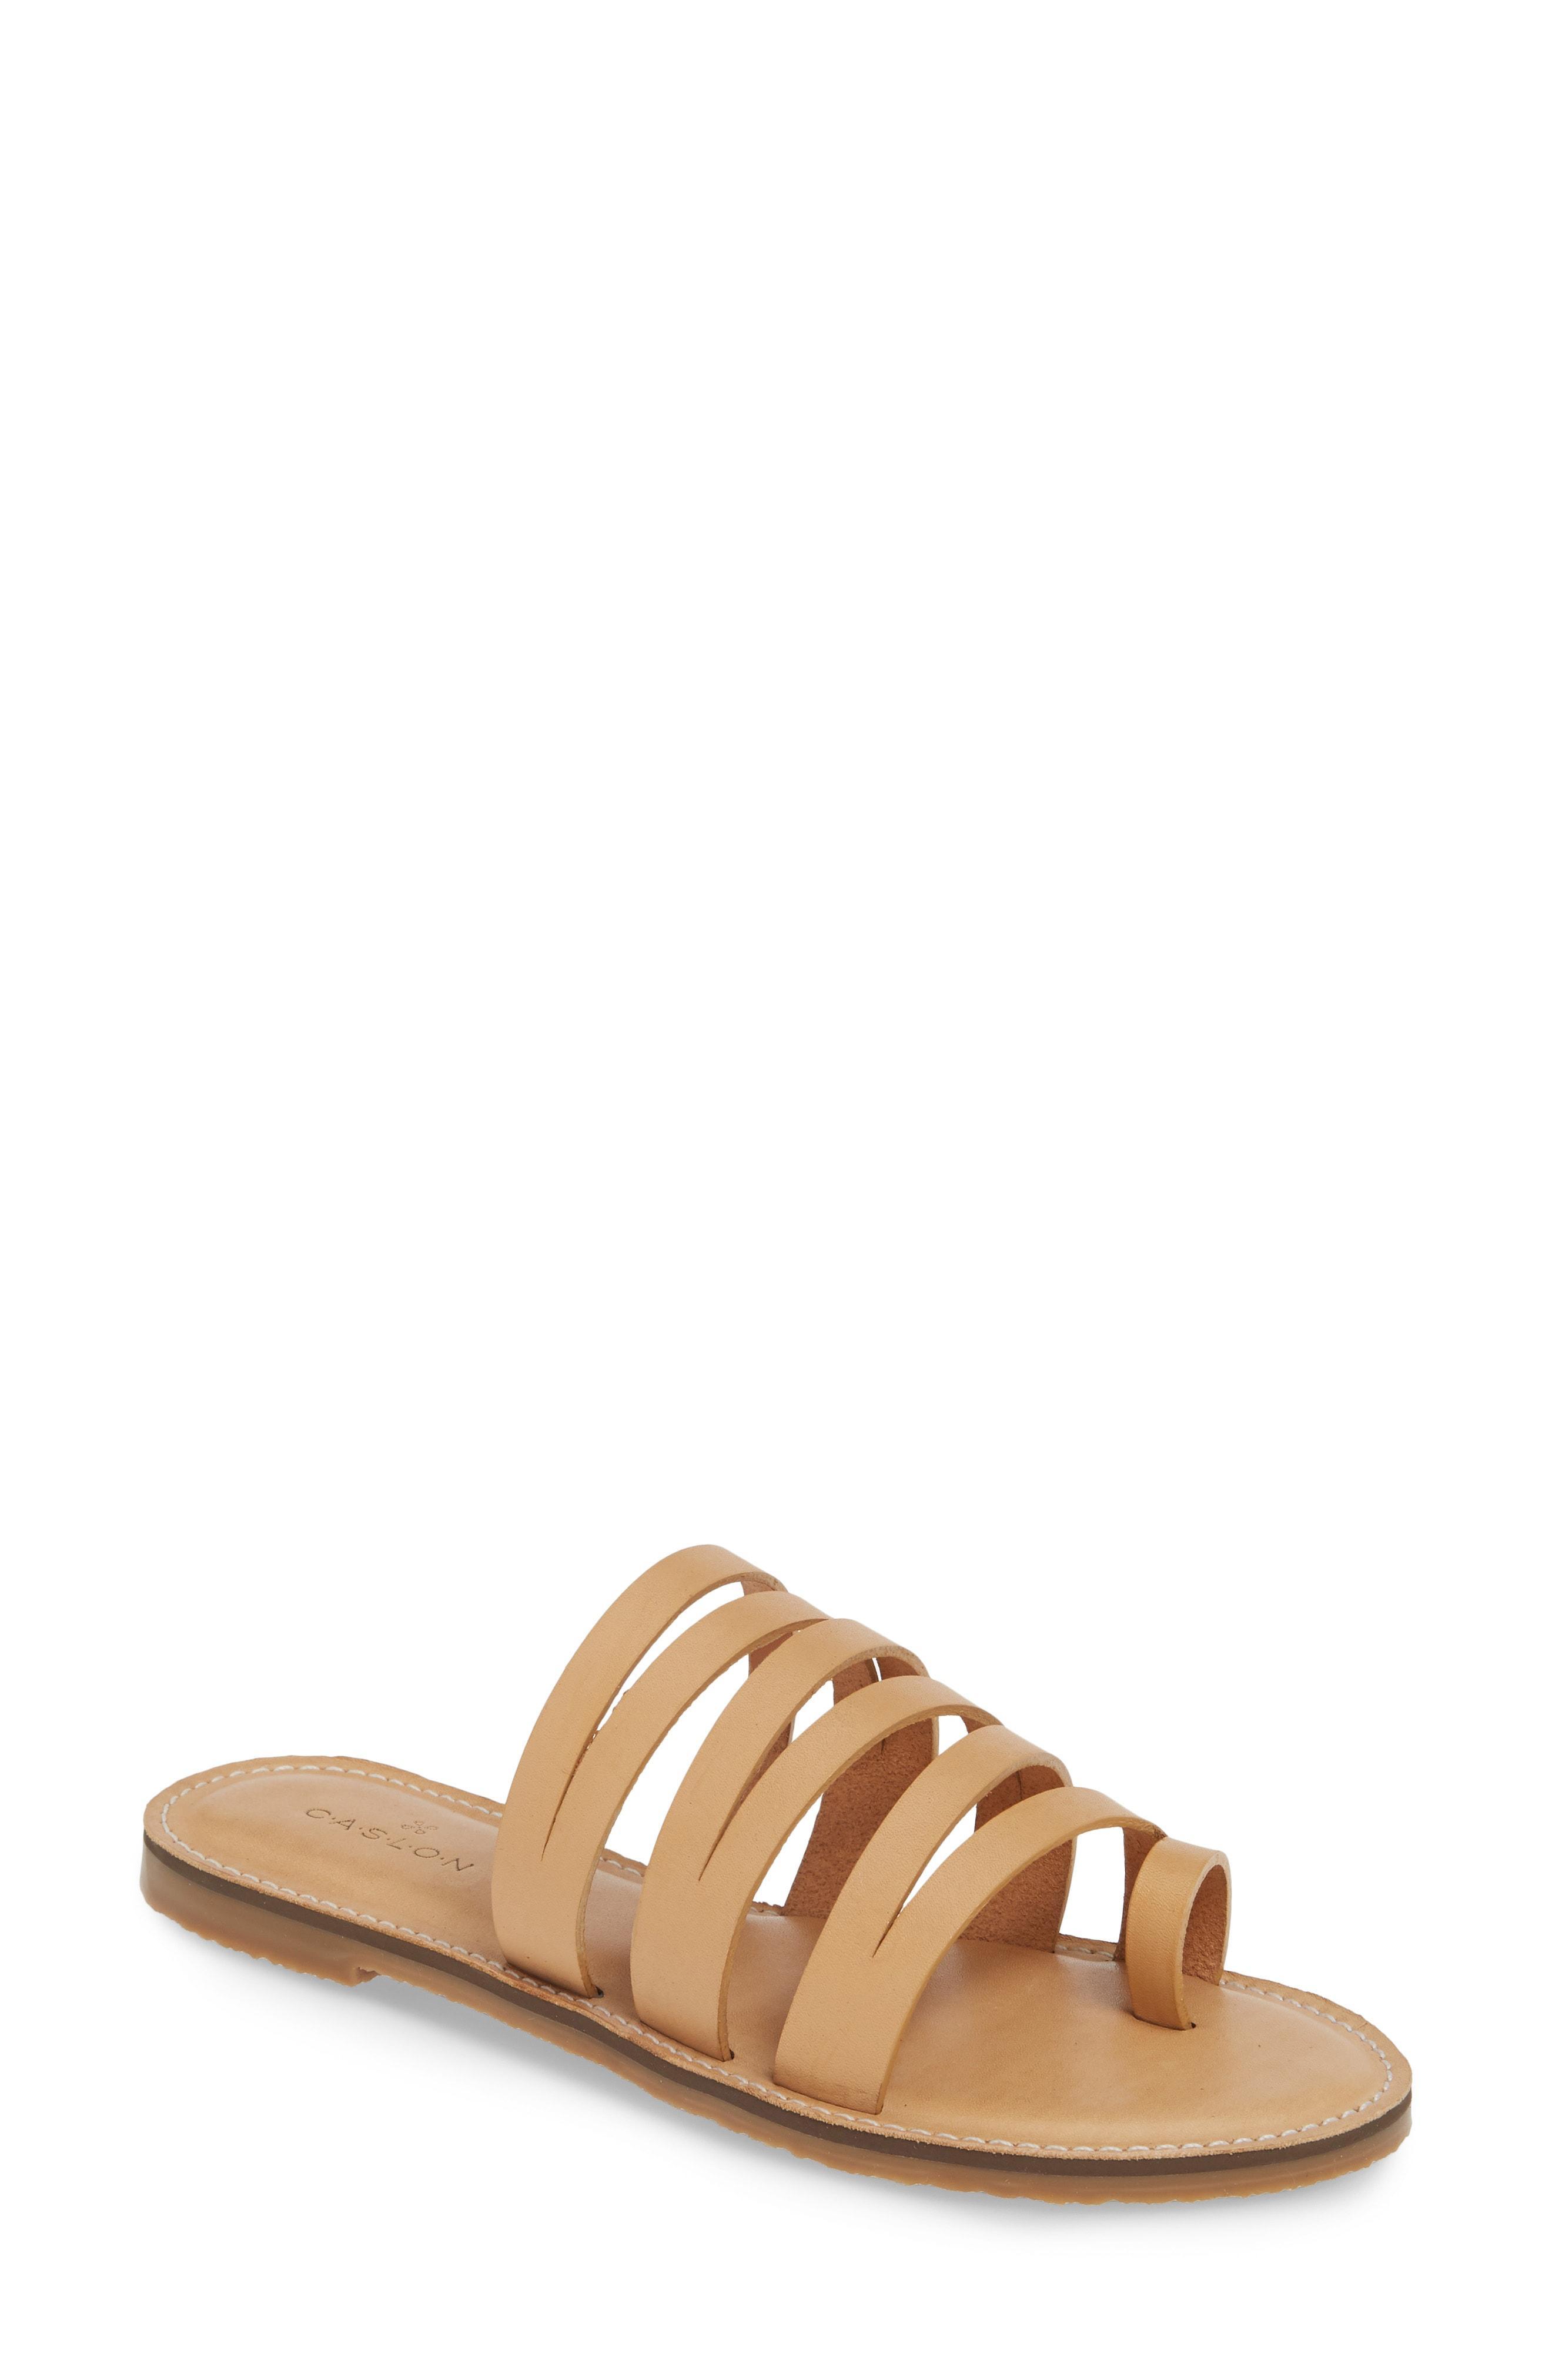 9d2641f418d Lyst - Caslon Caslon Owen Slide Sandal in Brown